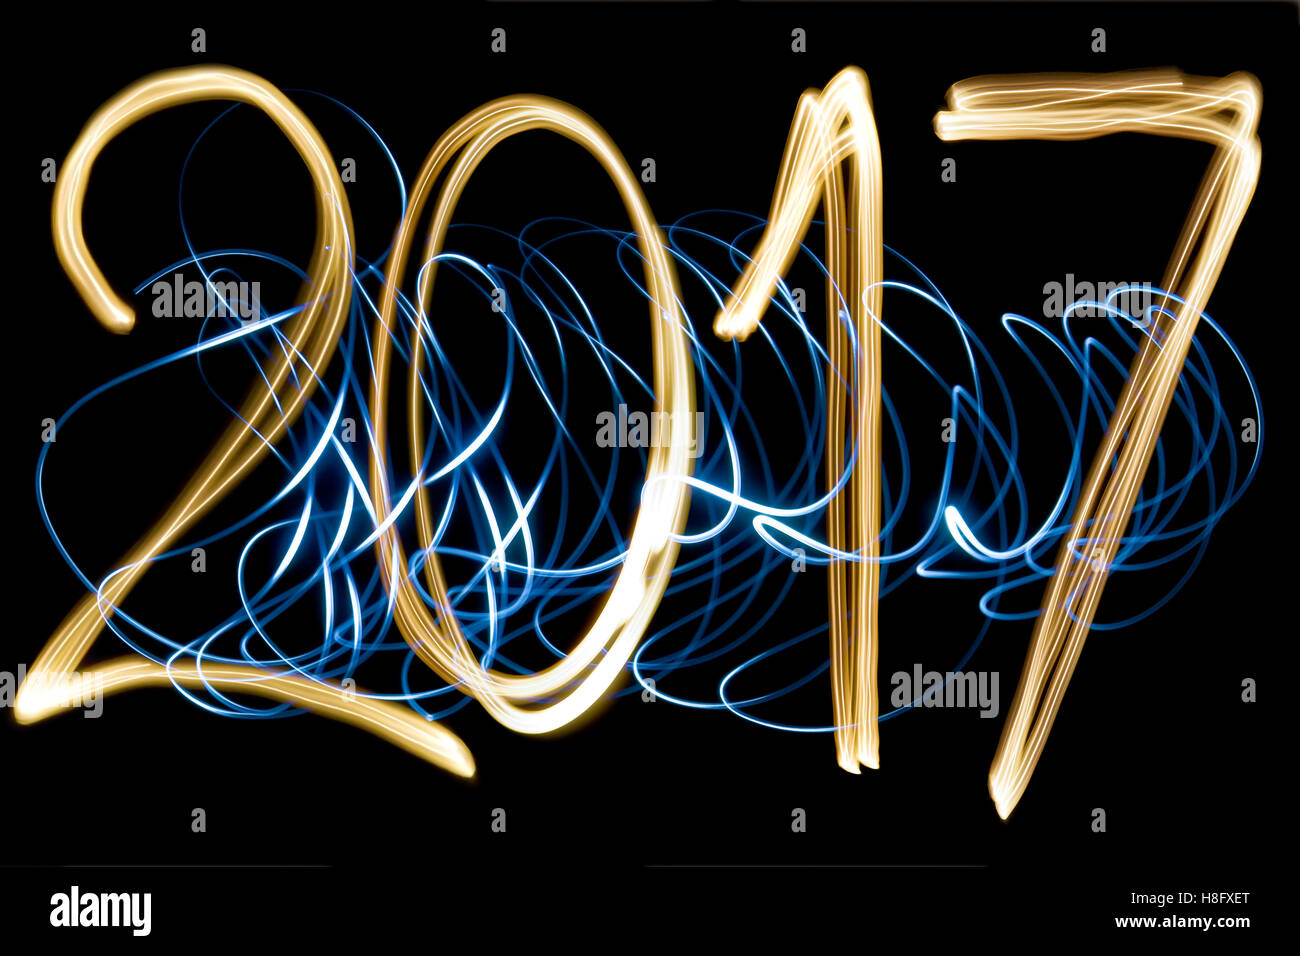 light painting year 2017 - Stock Image